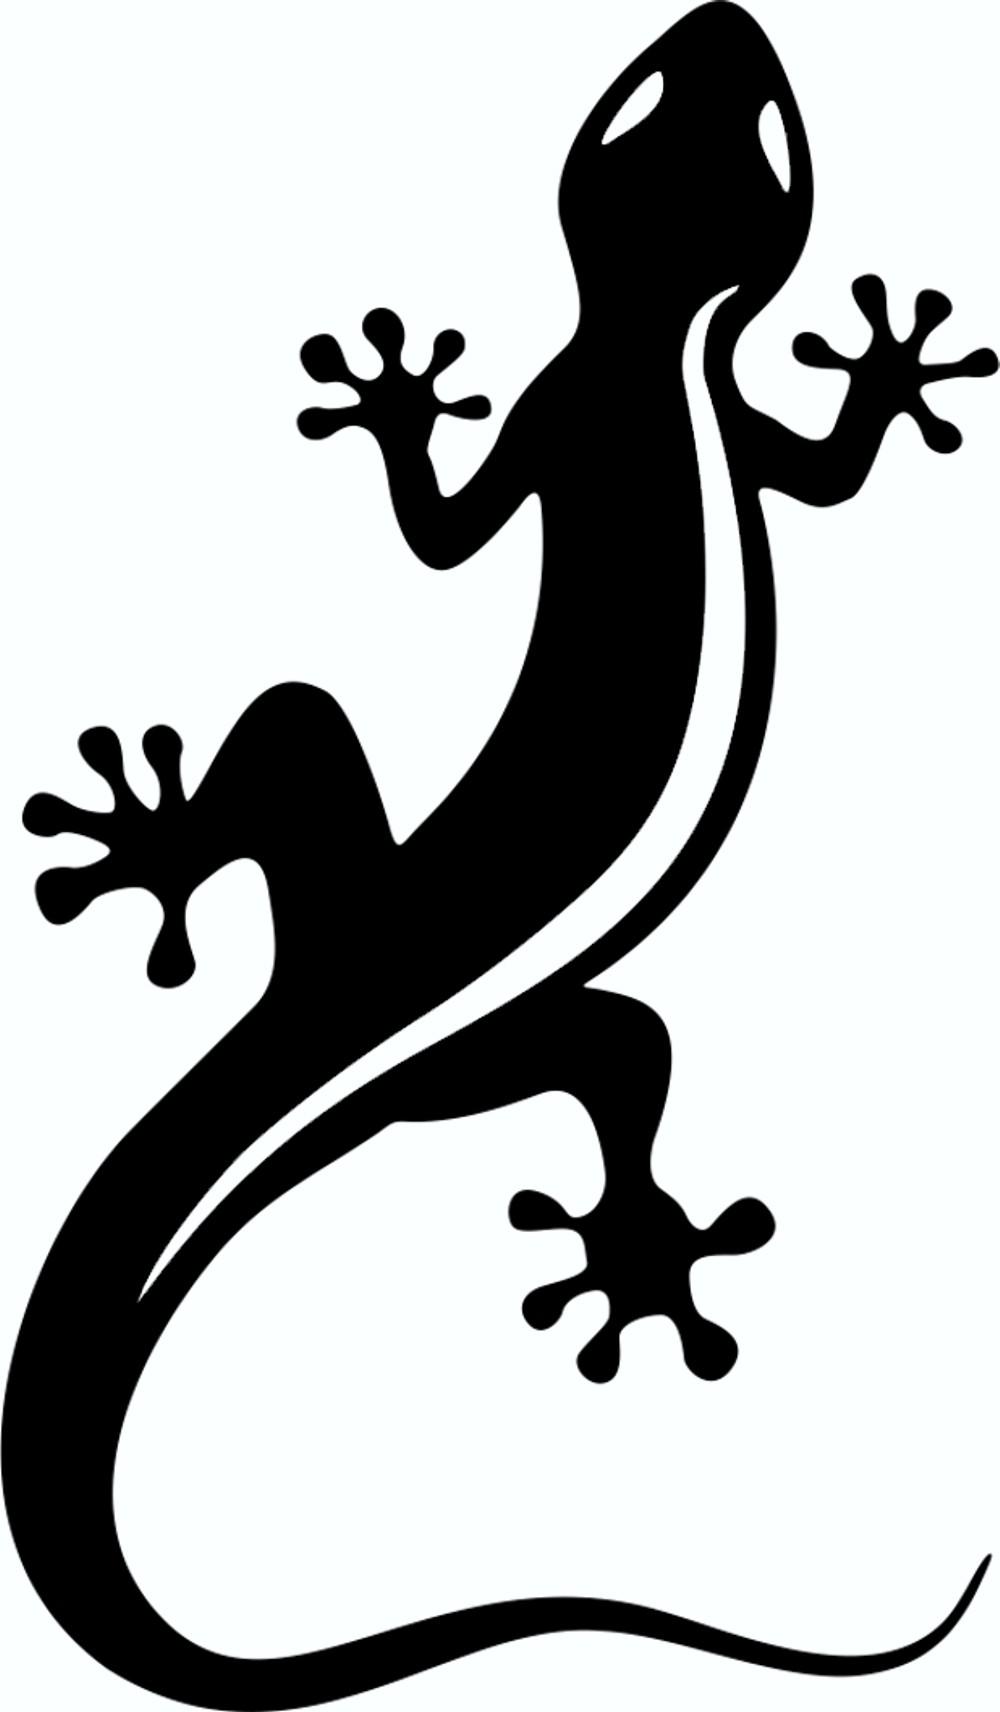 Aufkleber Gecko schwarz – Bild 1